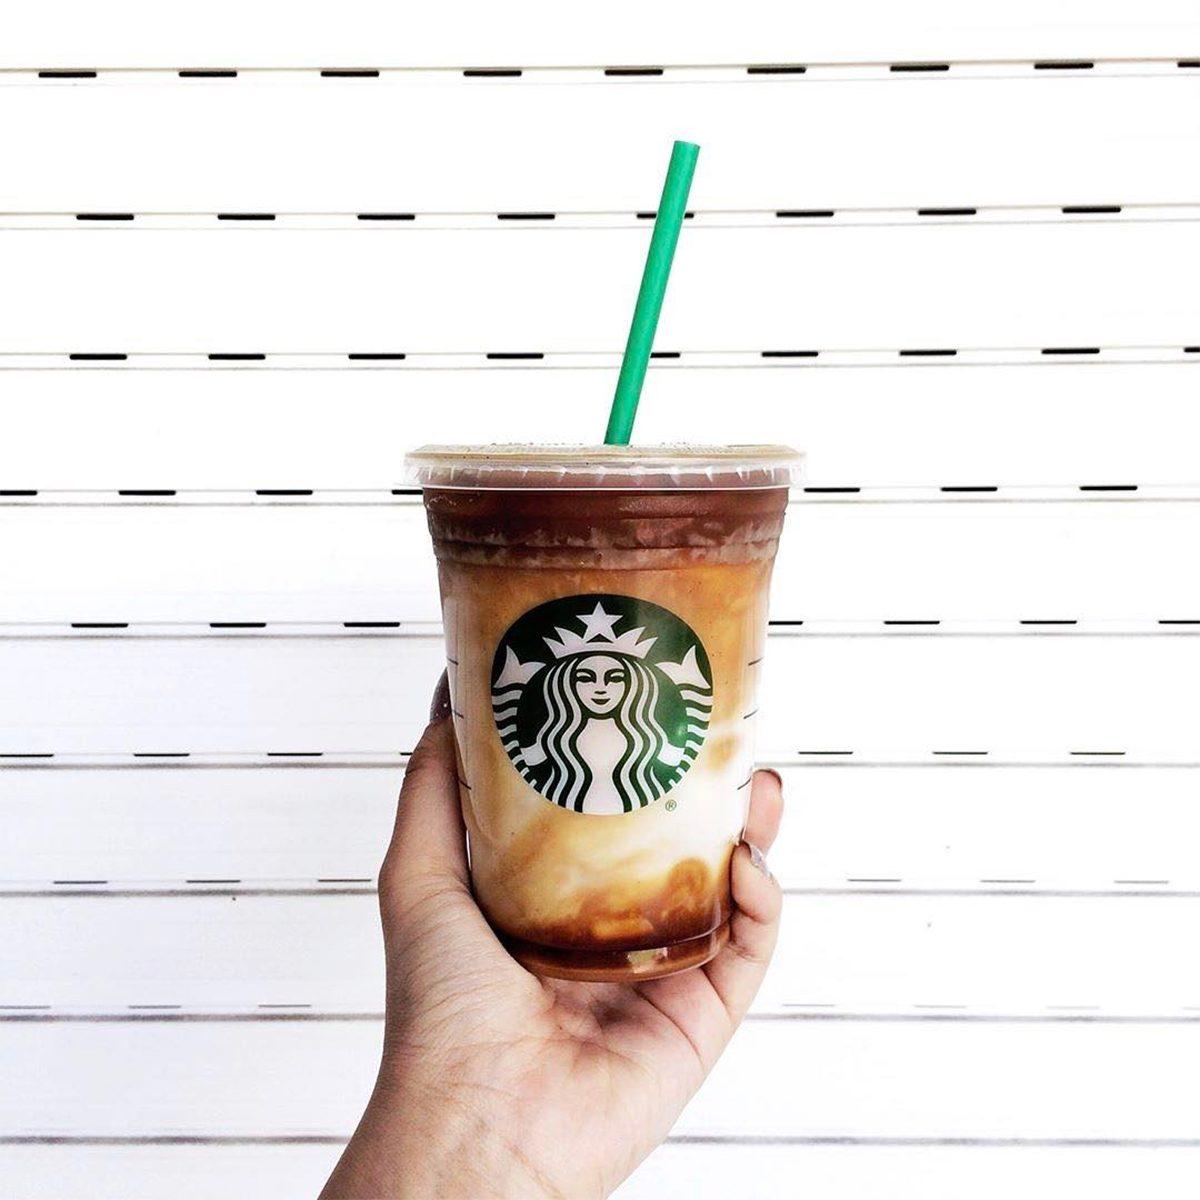 9 Starbucks Secret Menu Items You'll Want to Try | Taste ...